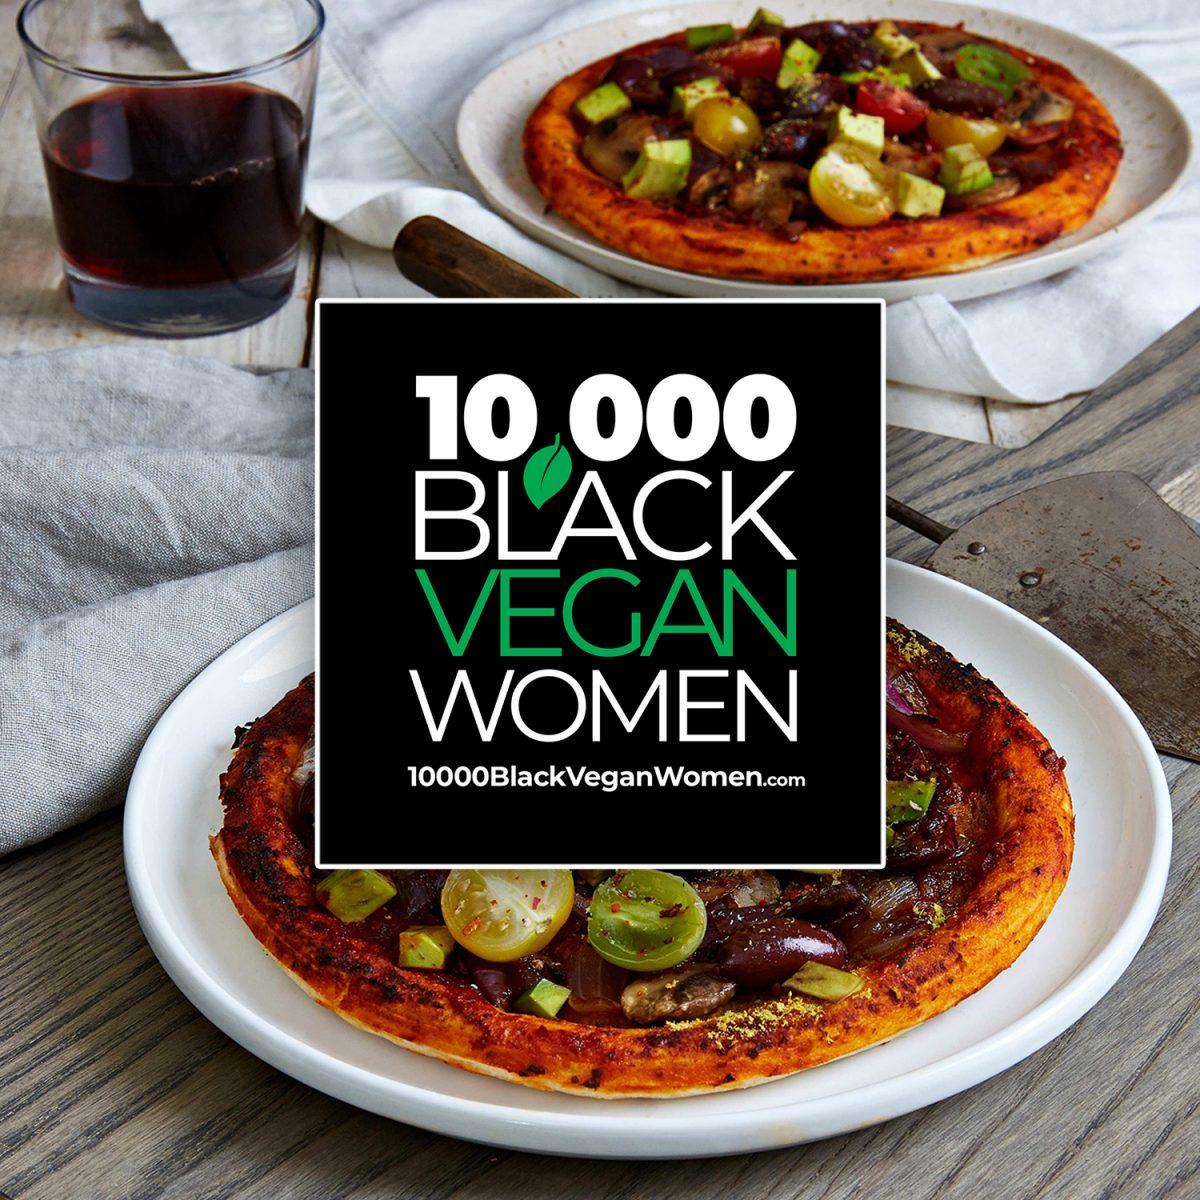 10,000 Black Vegan Women